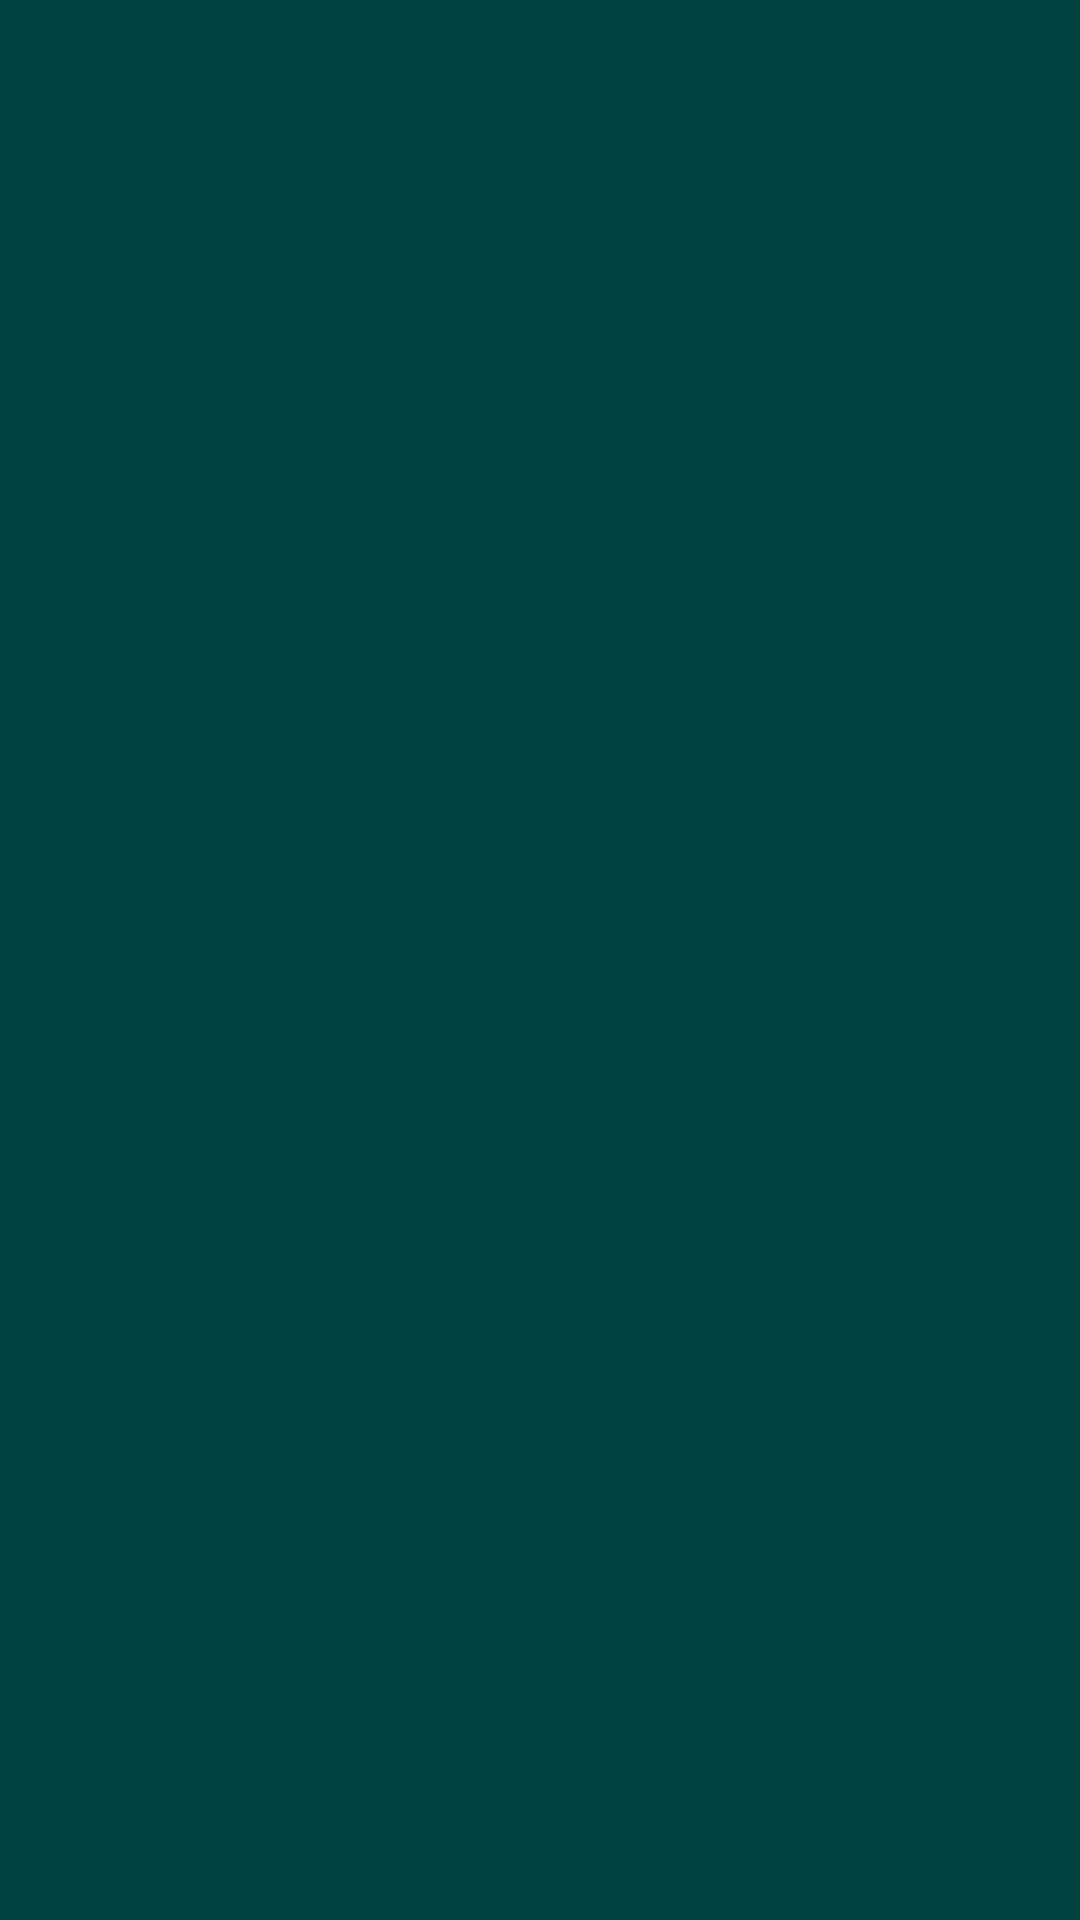 1080x1920 Warm Black Solid Color Background